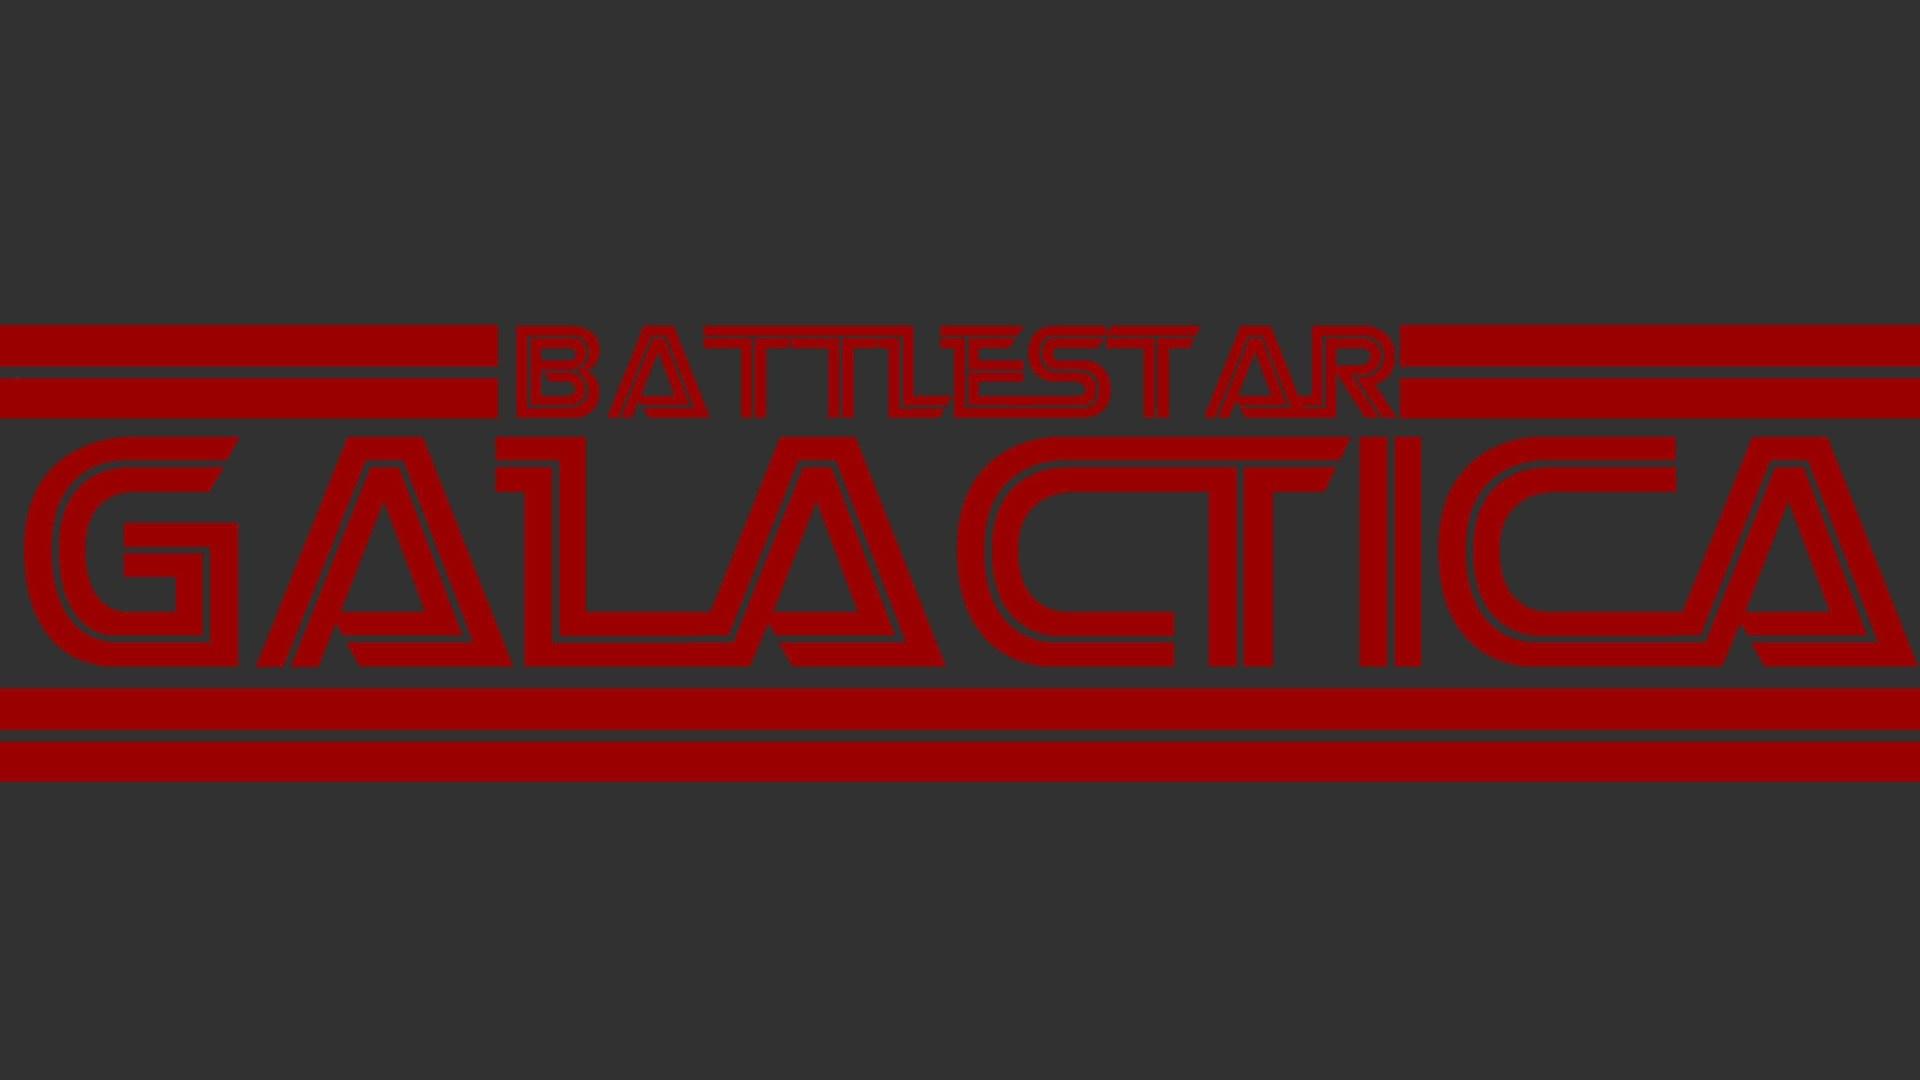 1920x1080-px-hd-battlestar-galactica-by-Harley-Archibald-for-pocketfullofgrace-co-wallpaper-wpc580941